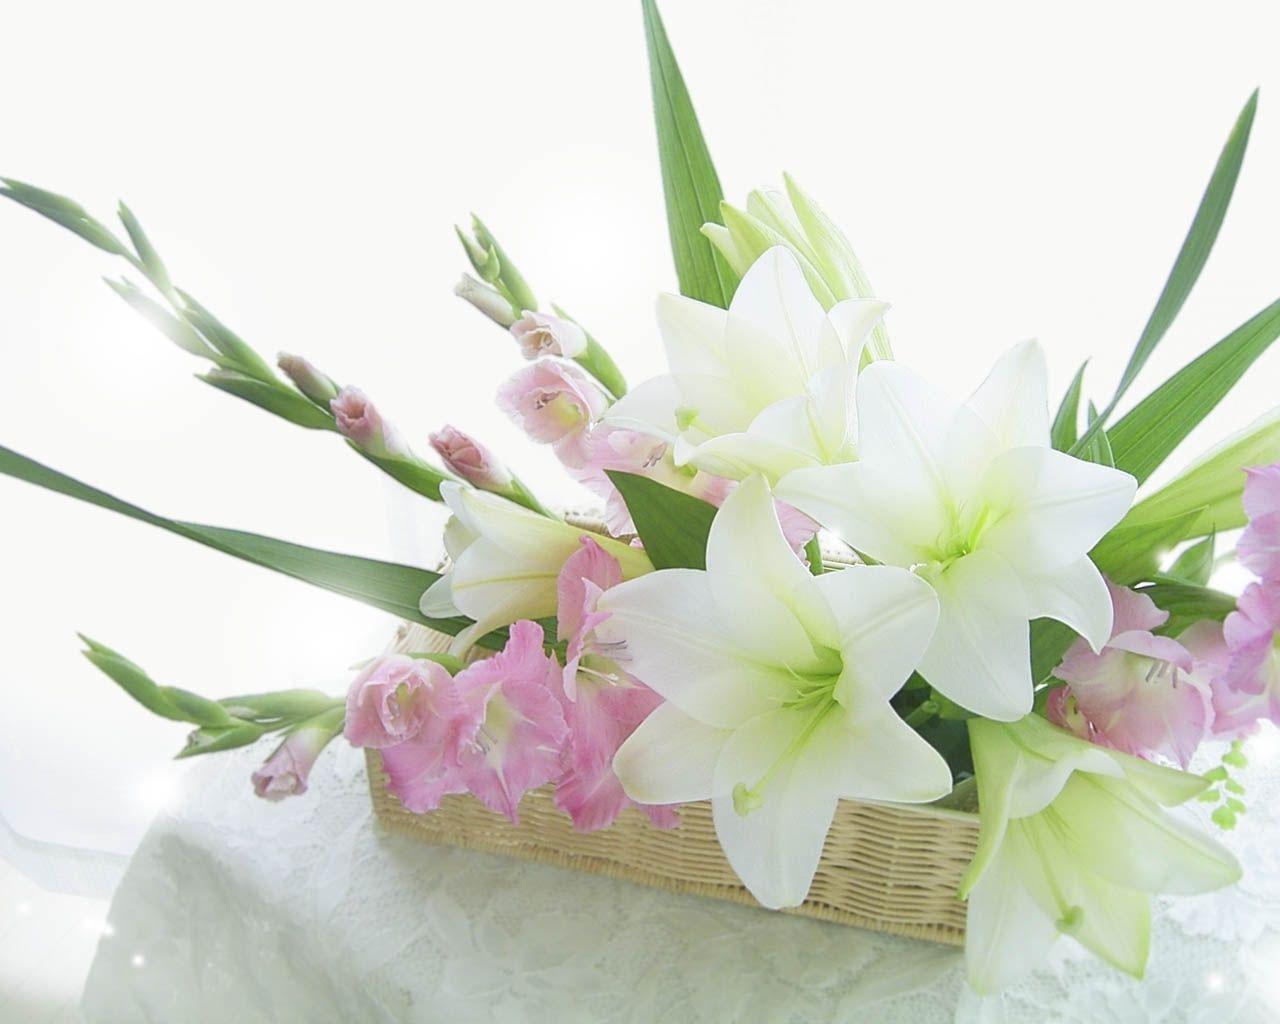 Beautiful <b>Flower Wallpapers</b> For You: <b>Flowers Basket Wallpaper</b>